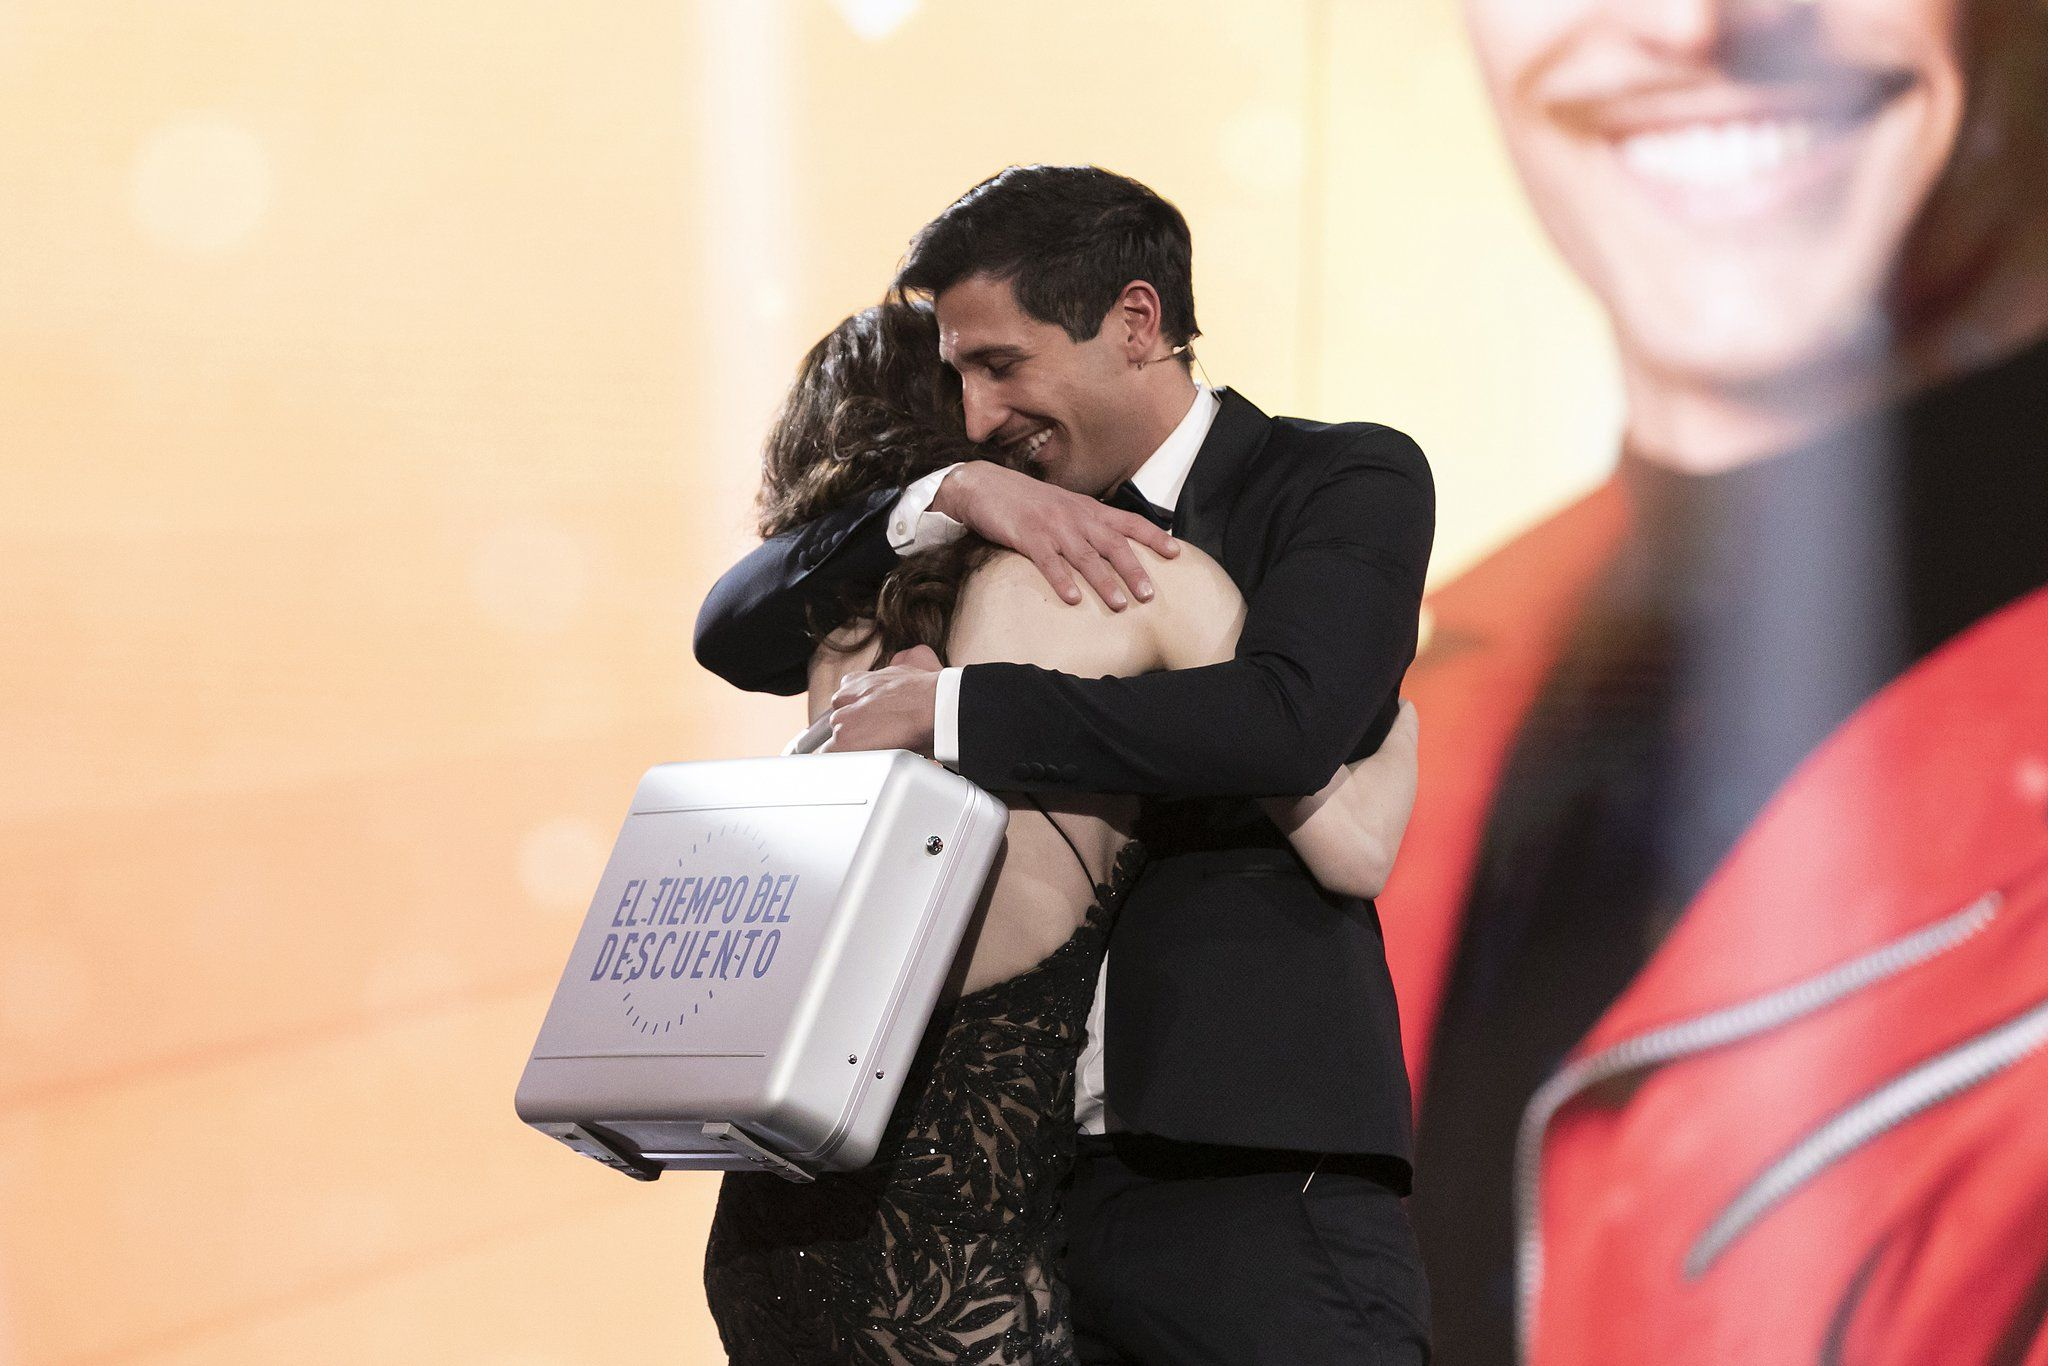 Gianmarco abraça a Adara en convertir se en el guanyador  Telecinco